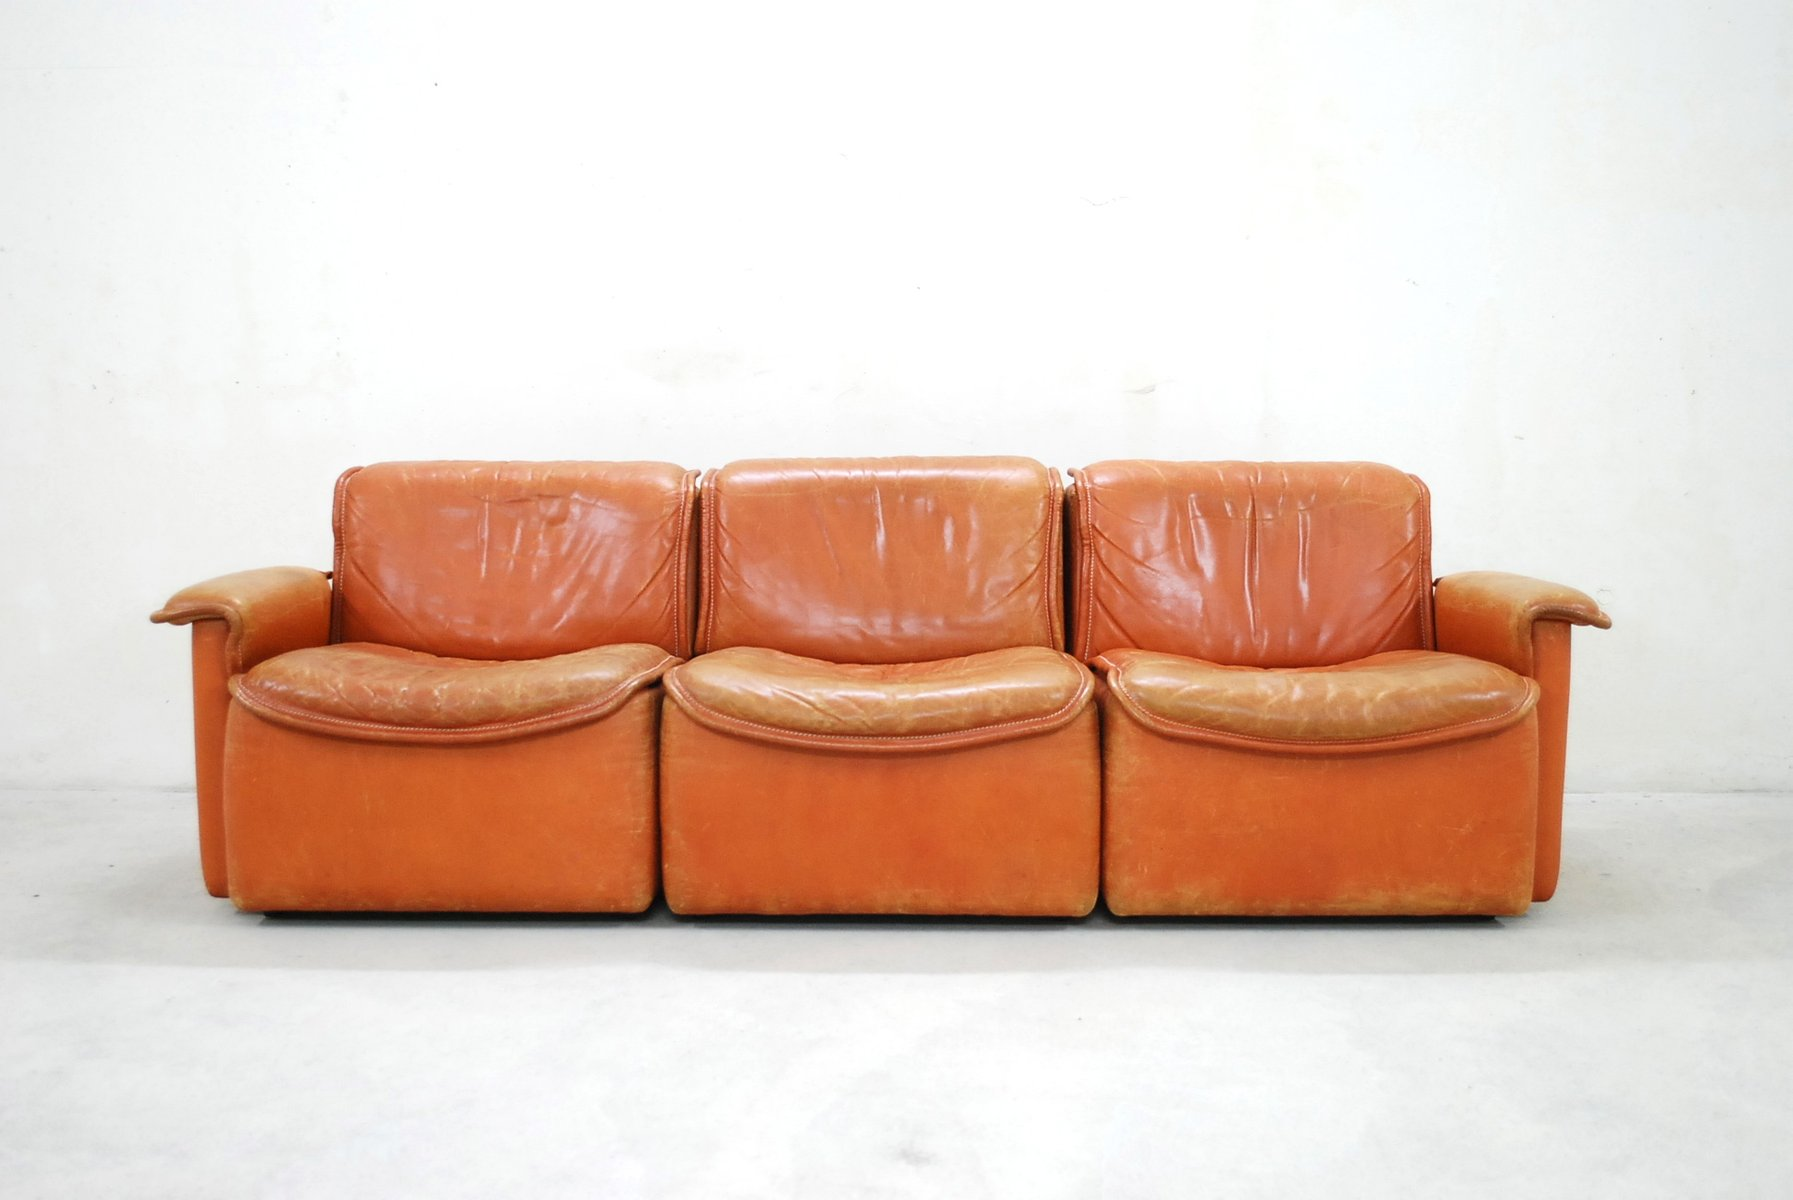 Sofa Cognac ds 12 modular cognac leather sofa from de sede 1980 for sale at pamono